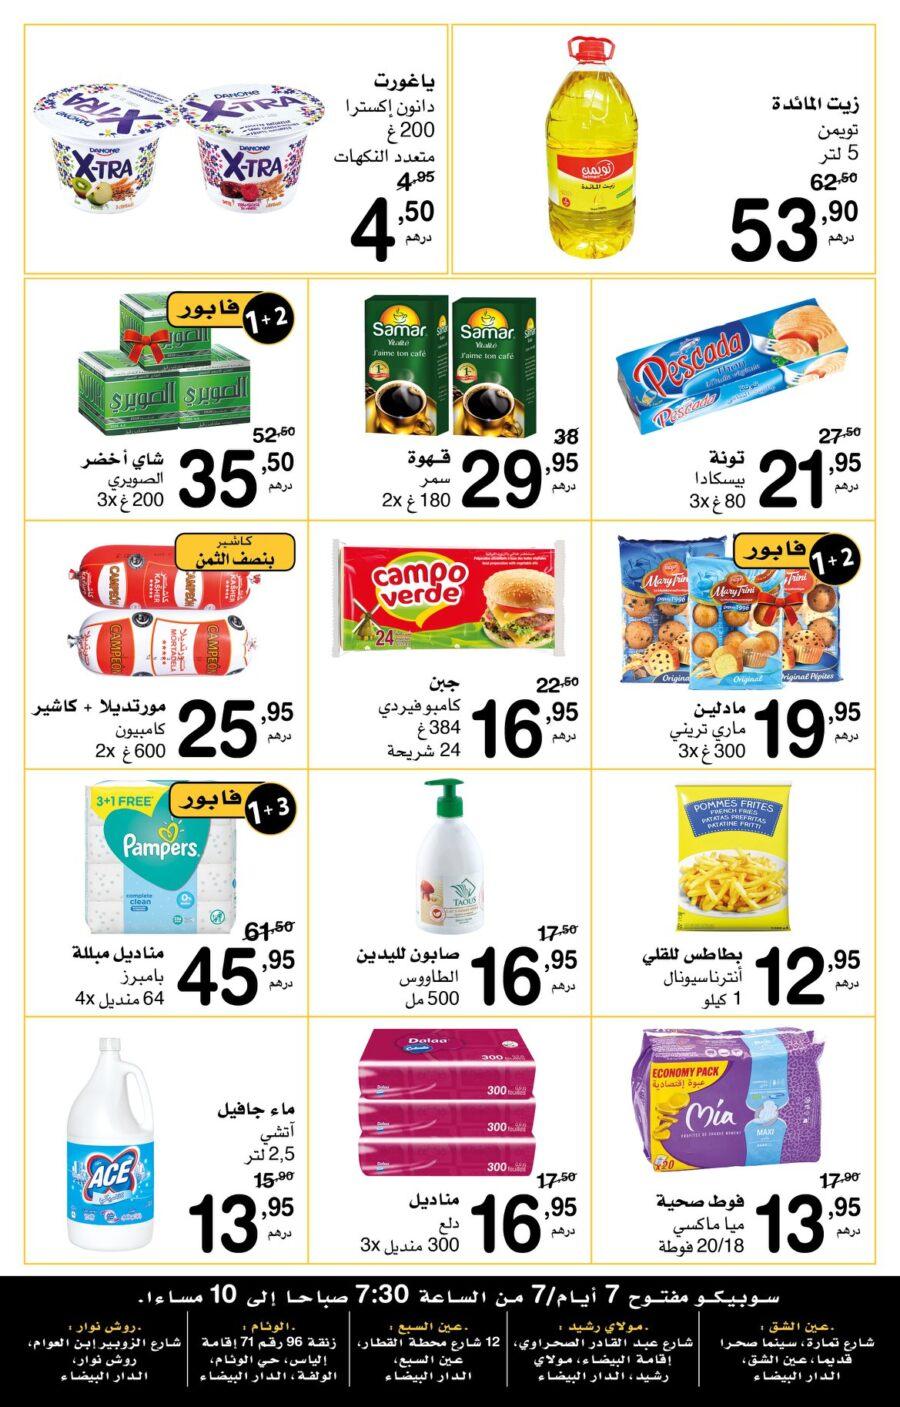 Catalogue Supeco Maroc أثمنة ديما رخيصة du 3 au 16 Septembre 2020